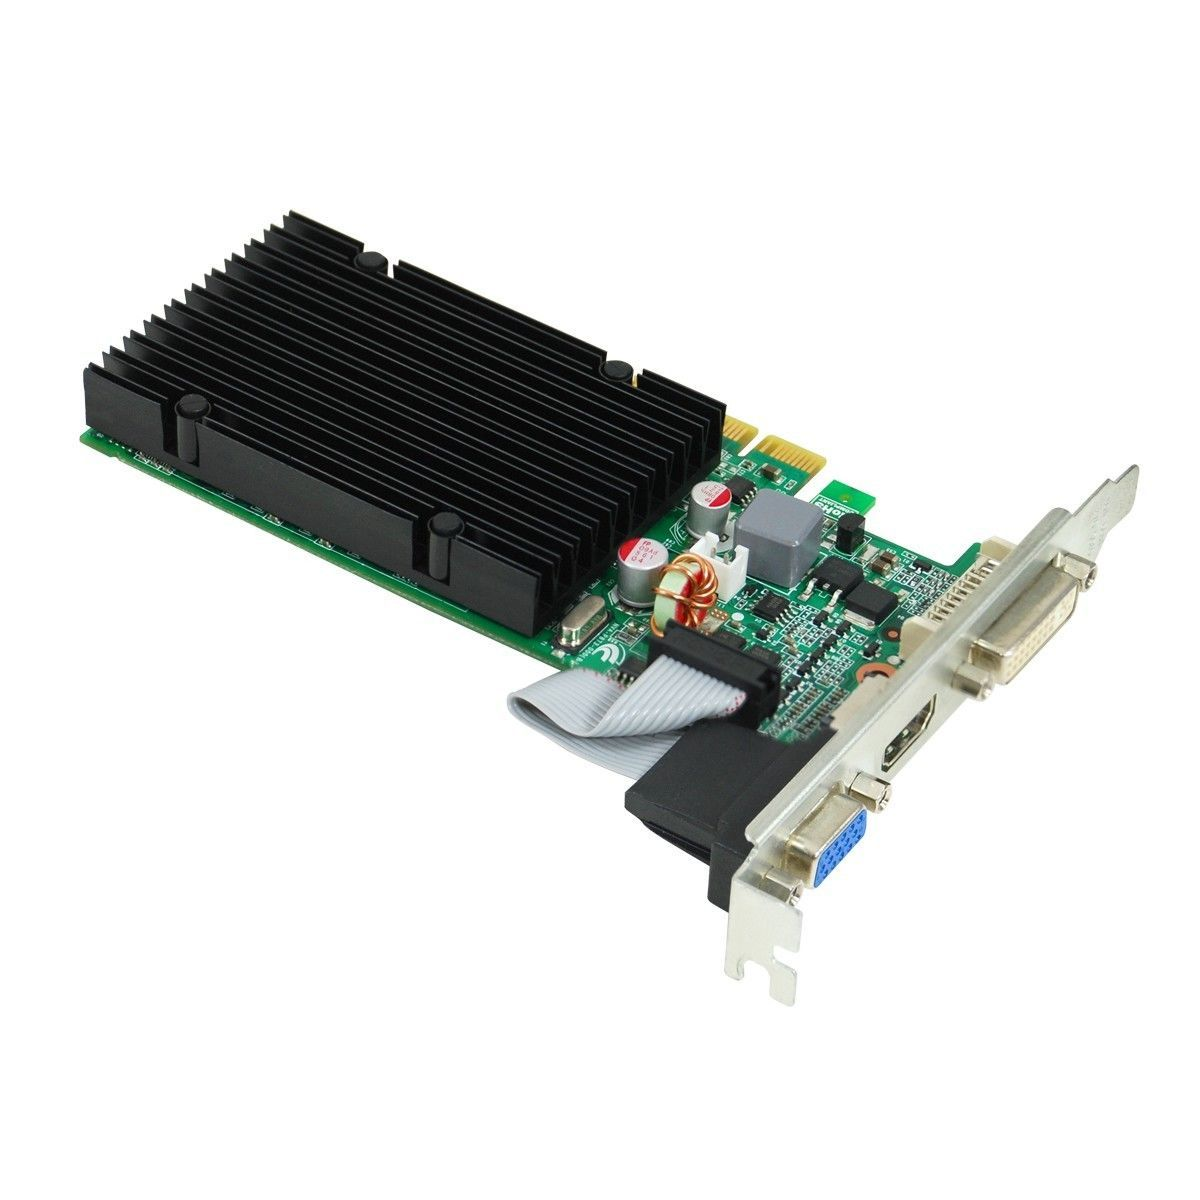 Placa de Vídeo EVGA NVIDIA GeForce GT 210 1GB, DDR3 - 01G-P3-1313-KR - PC FLORIPA